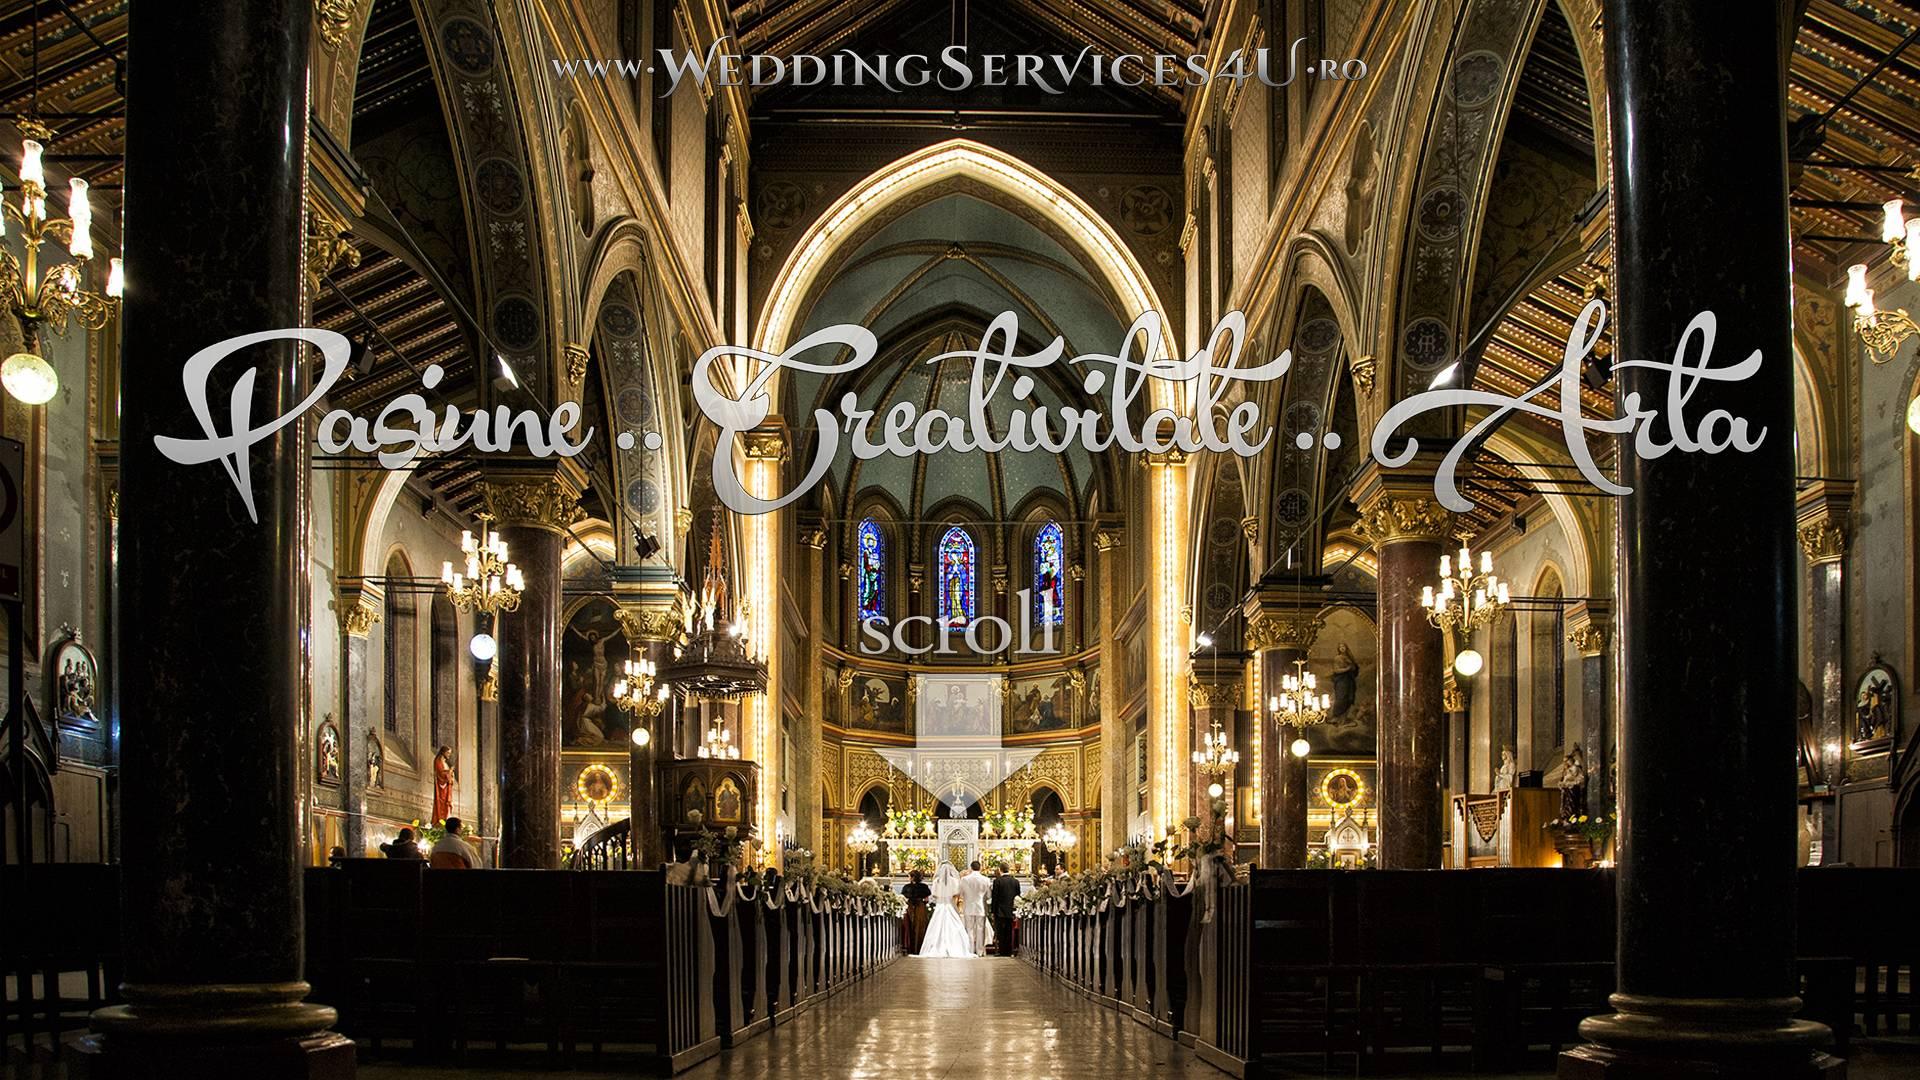 WeddingServices4U.ro Servicii Foto Video pentru Nunta si Botez, Fotograf Profesionist, Fotografie Artistica, Prelucrari Foto Profesionale, Albume FotoCarte,